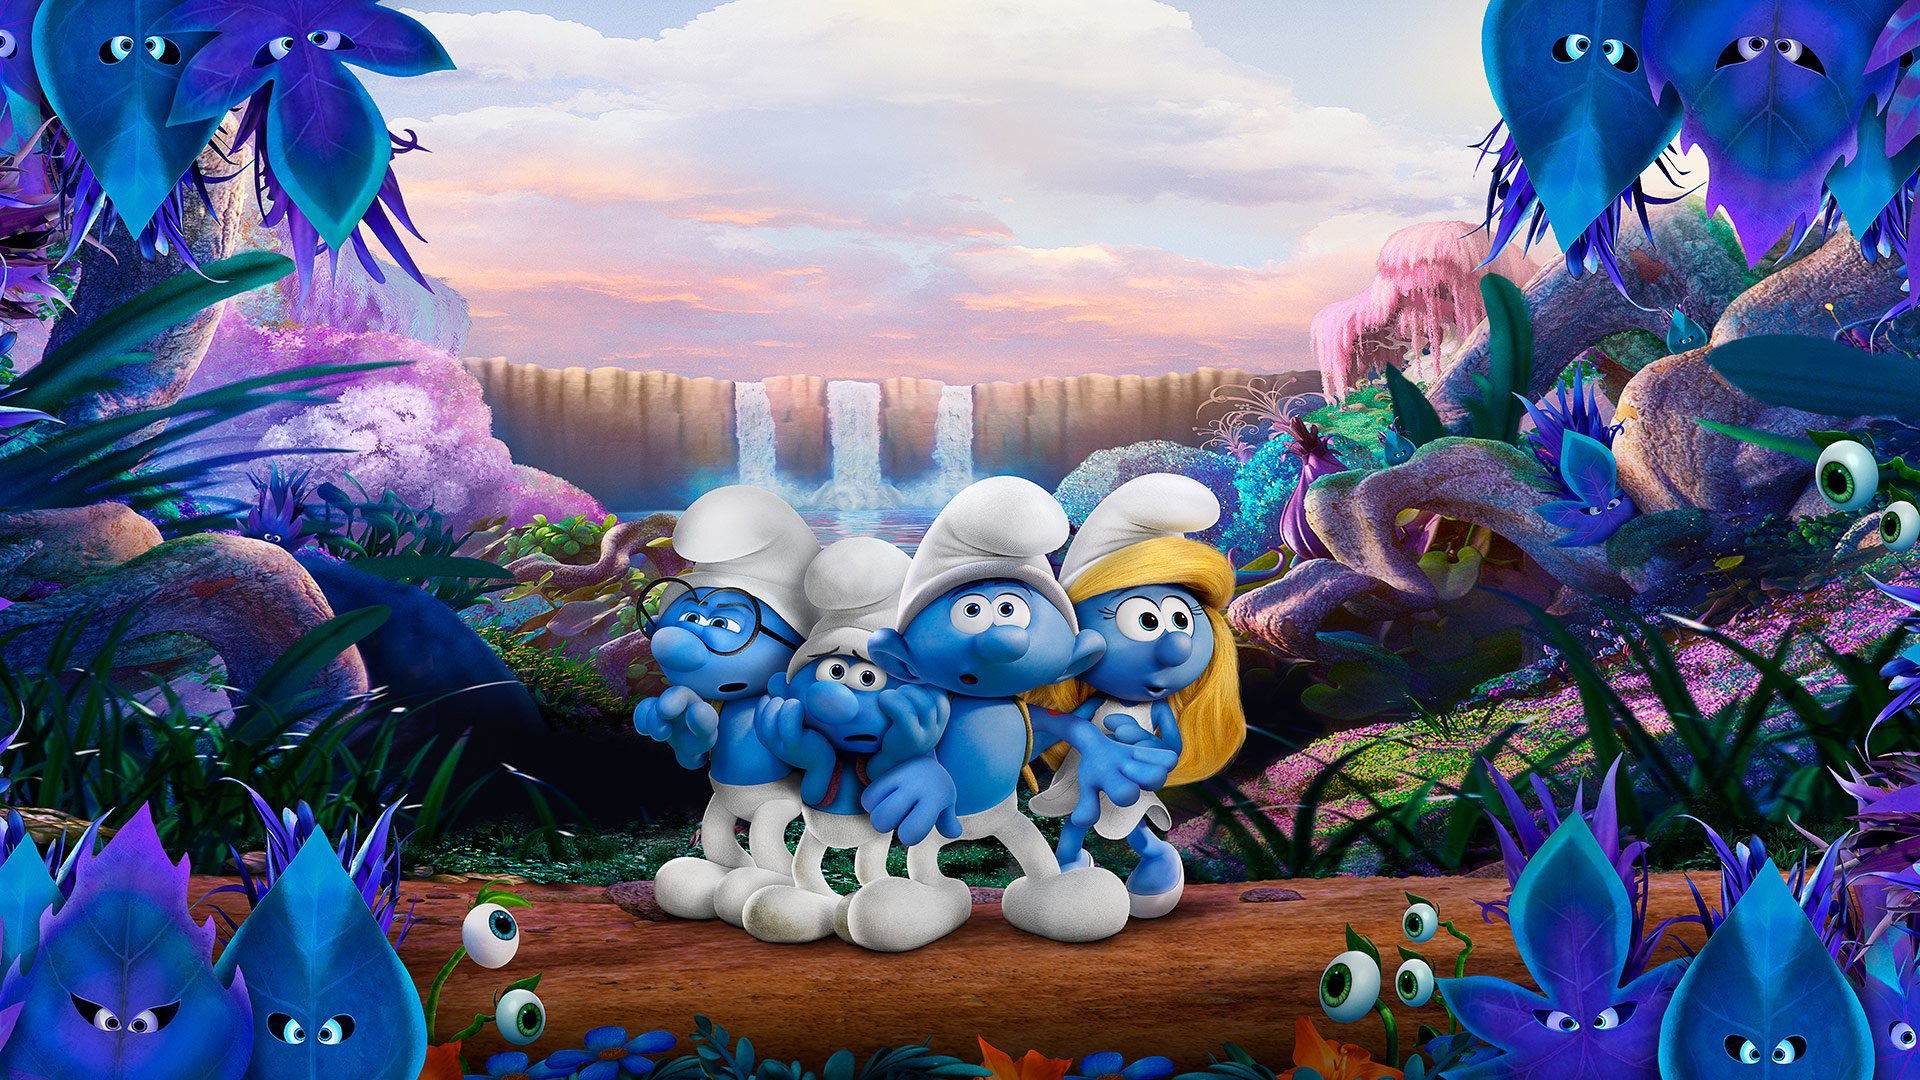 Smurfs: The Lost Village HD Wallpaper | Background Image ...